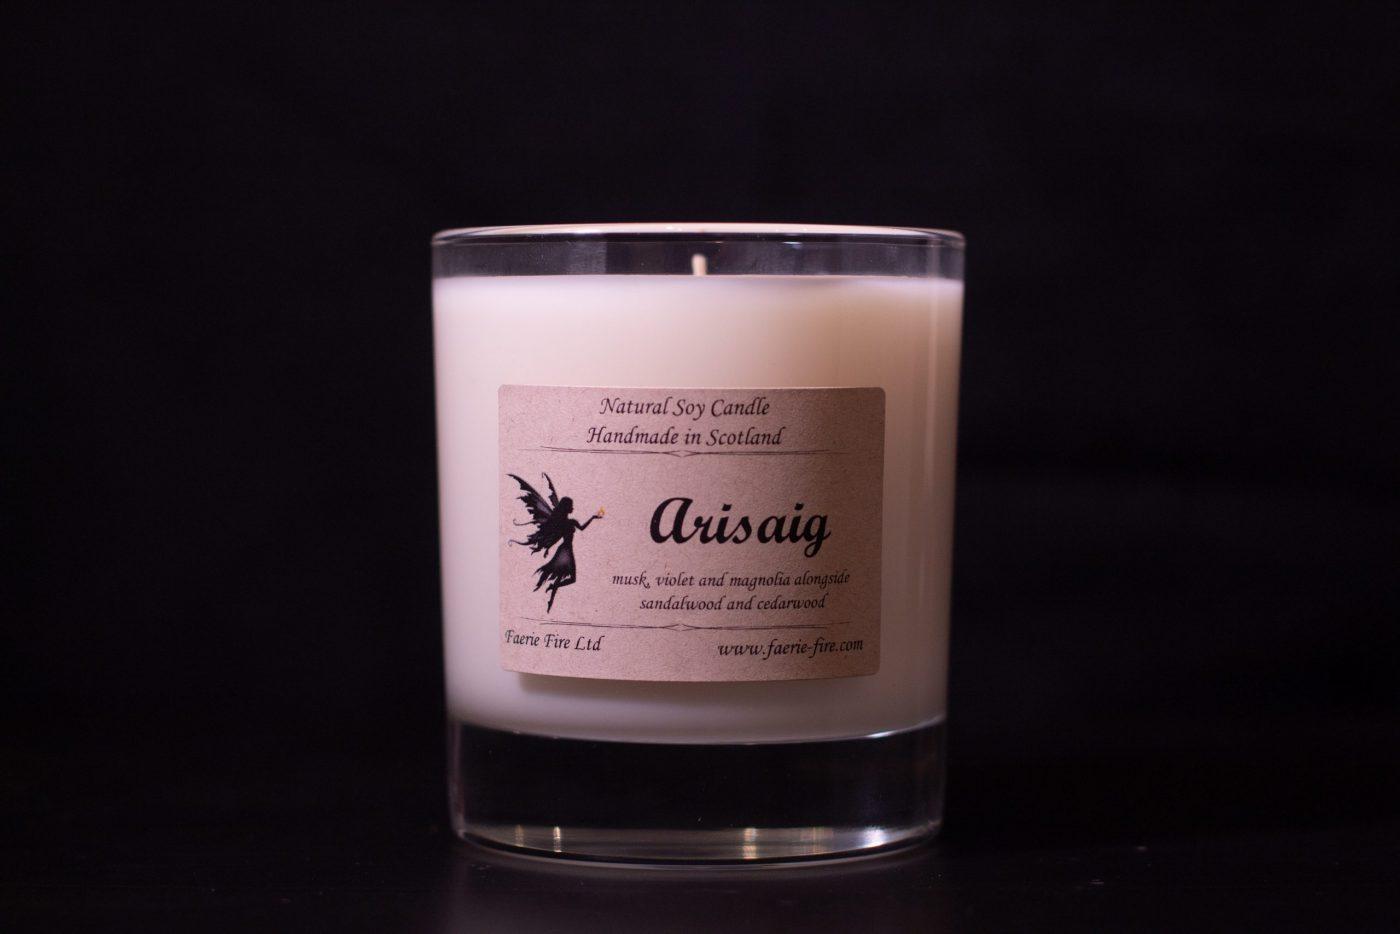 Arisaig Soy Wax Jar Candle 4 scaled